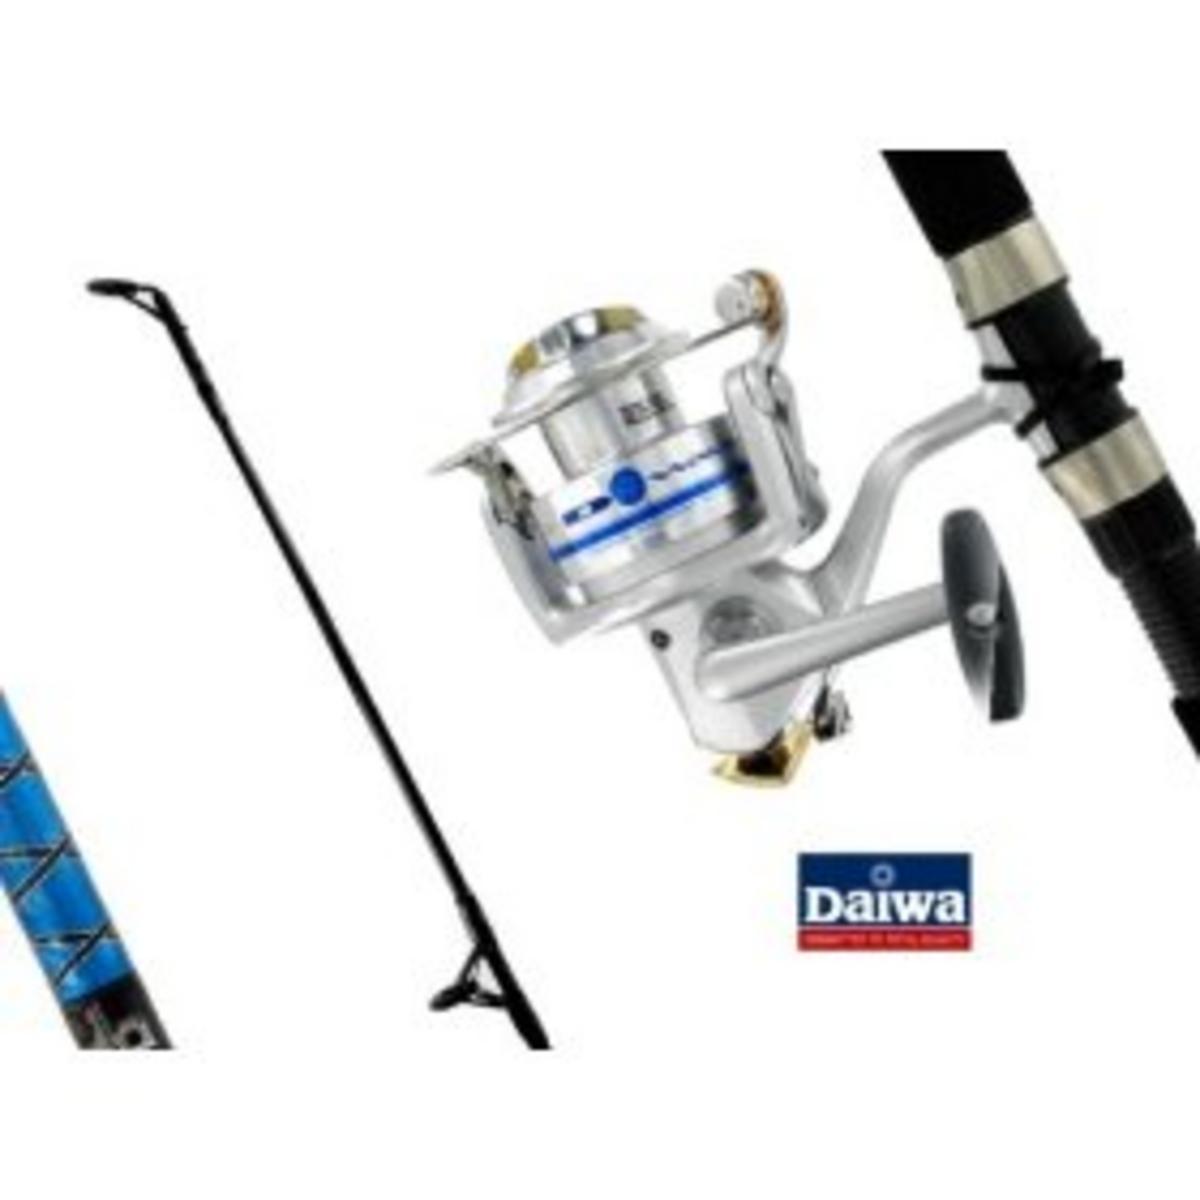 DAIWA D-WAVE 40 COMBO 8' 20LB  Model No DWV40-B/F802M-20C SPINNING REEL